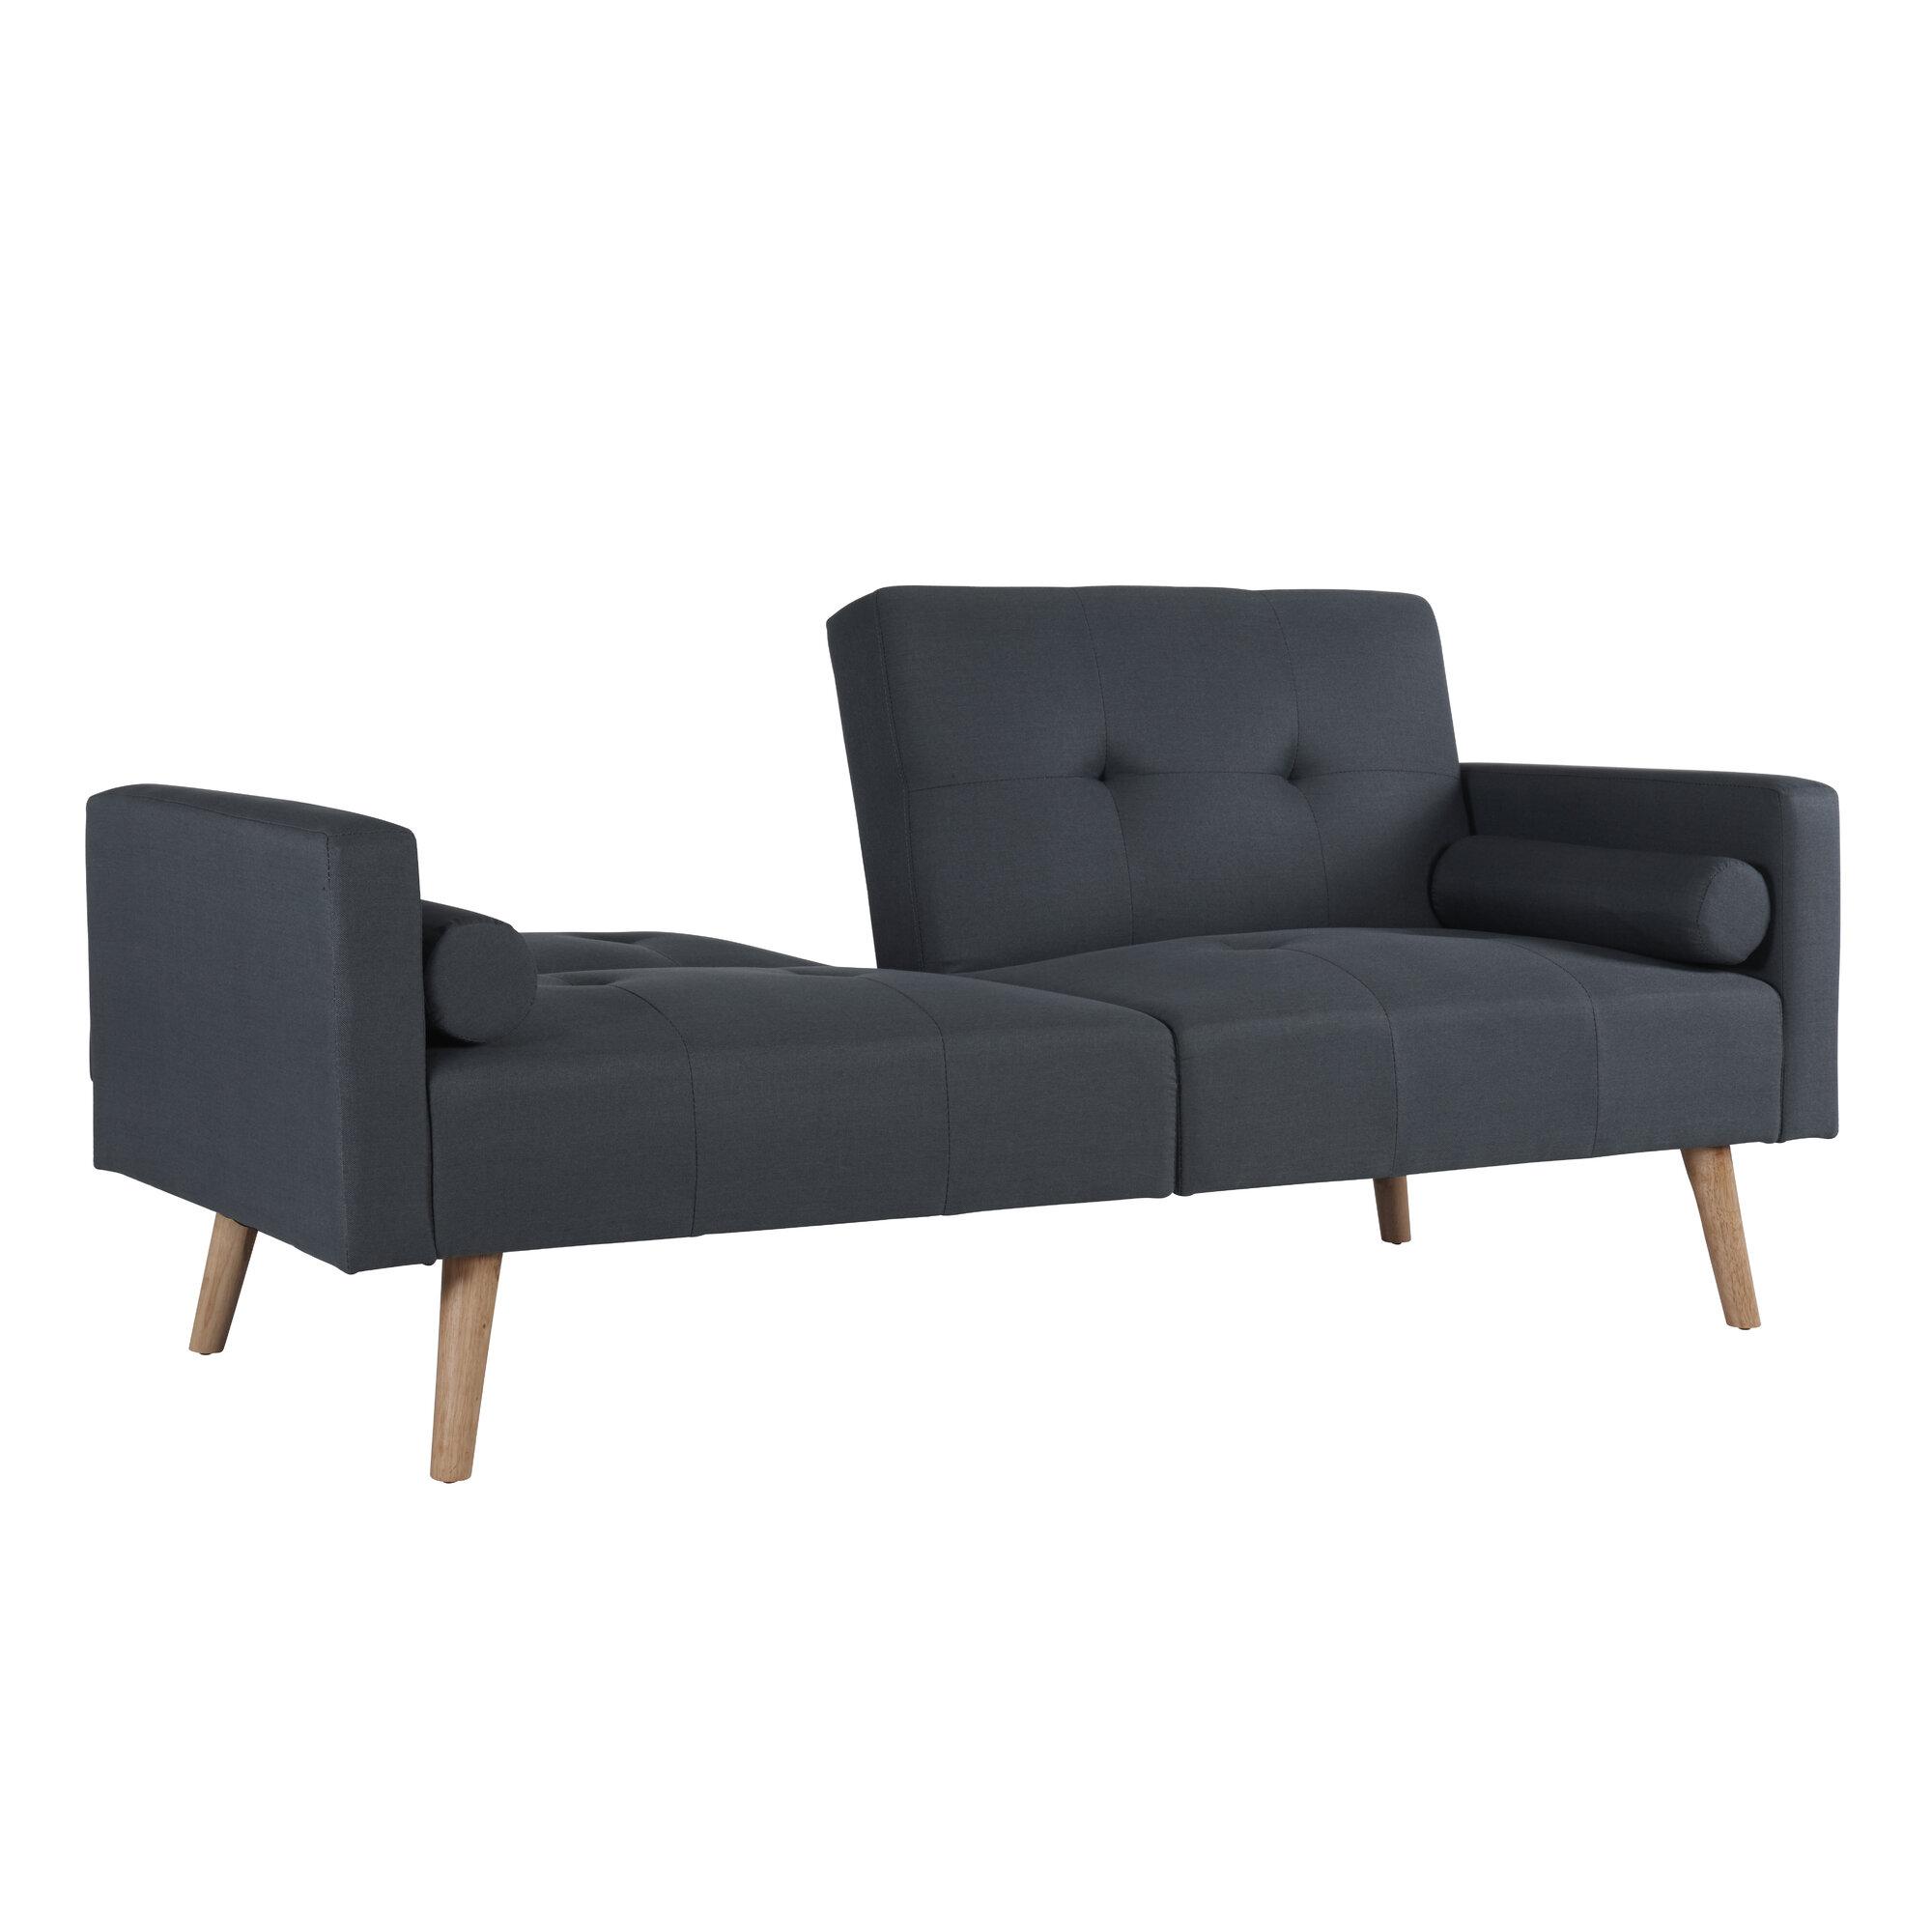 Simmons Futons Montreal Convertible Sofa